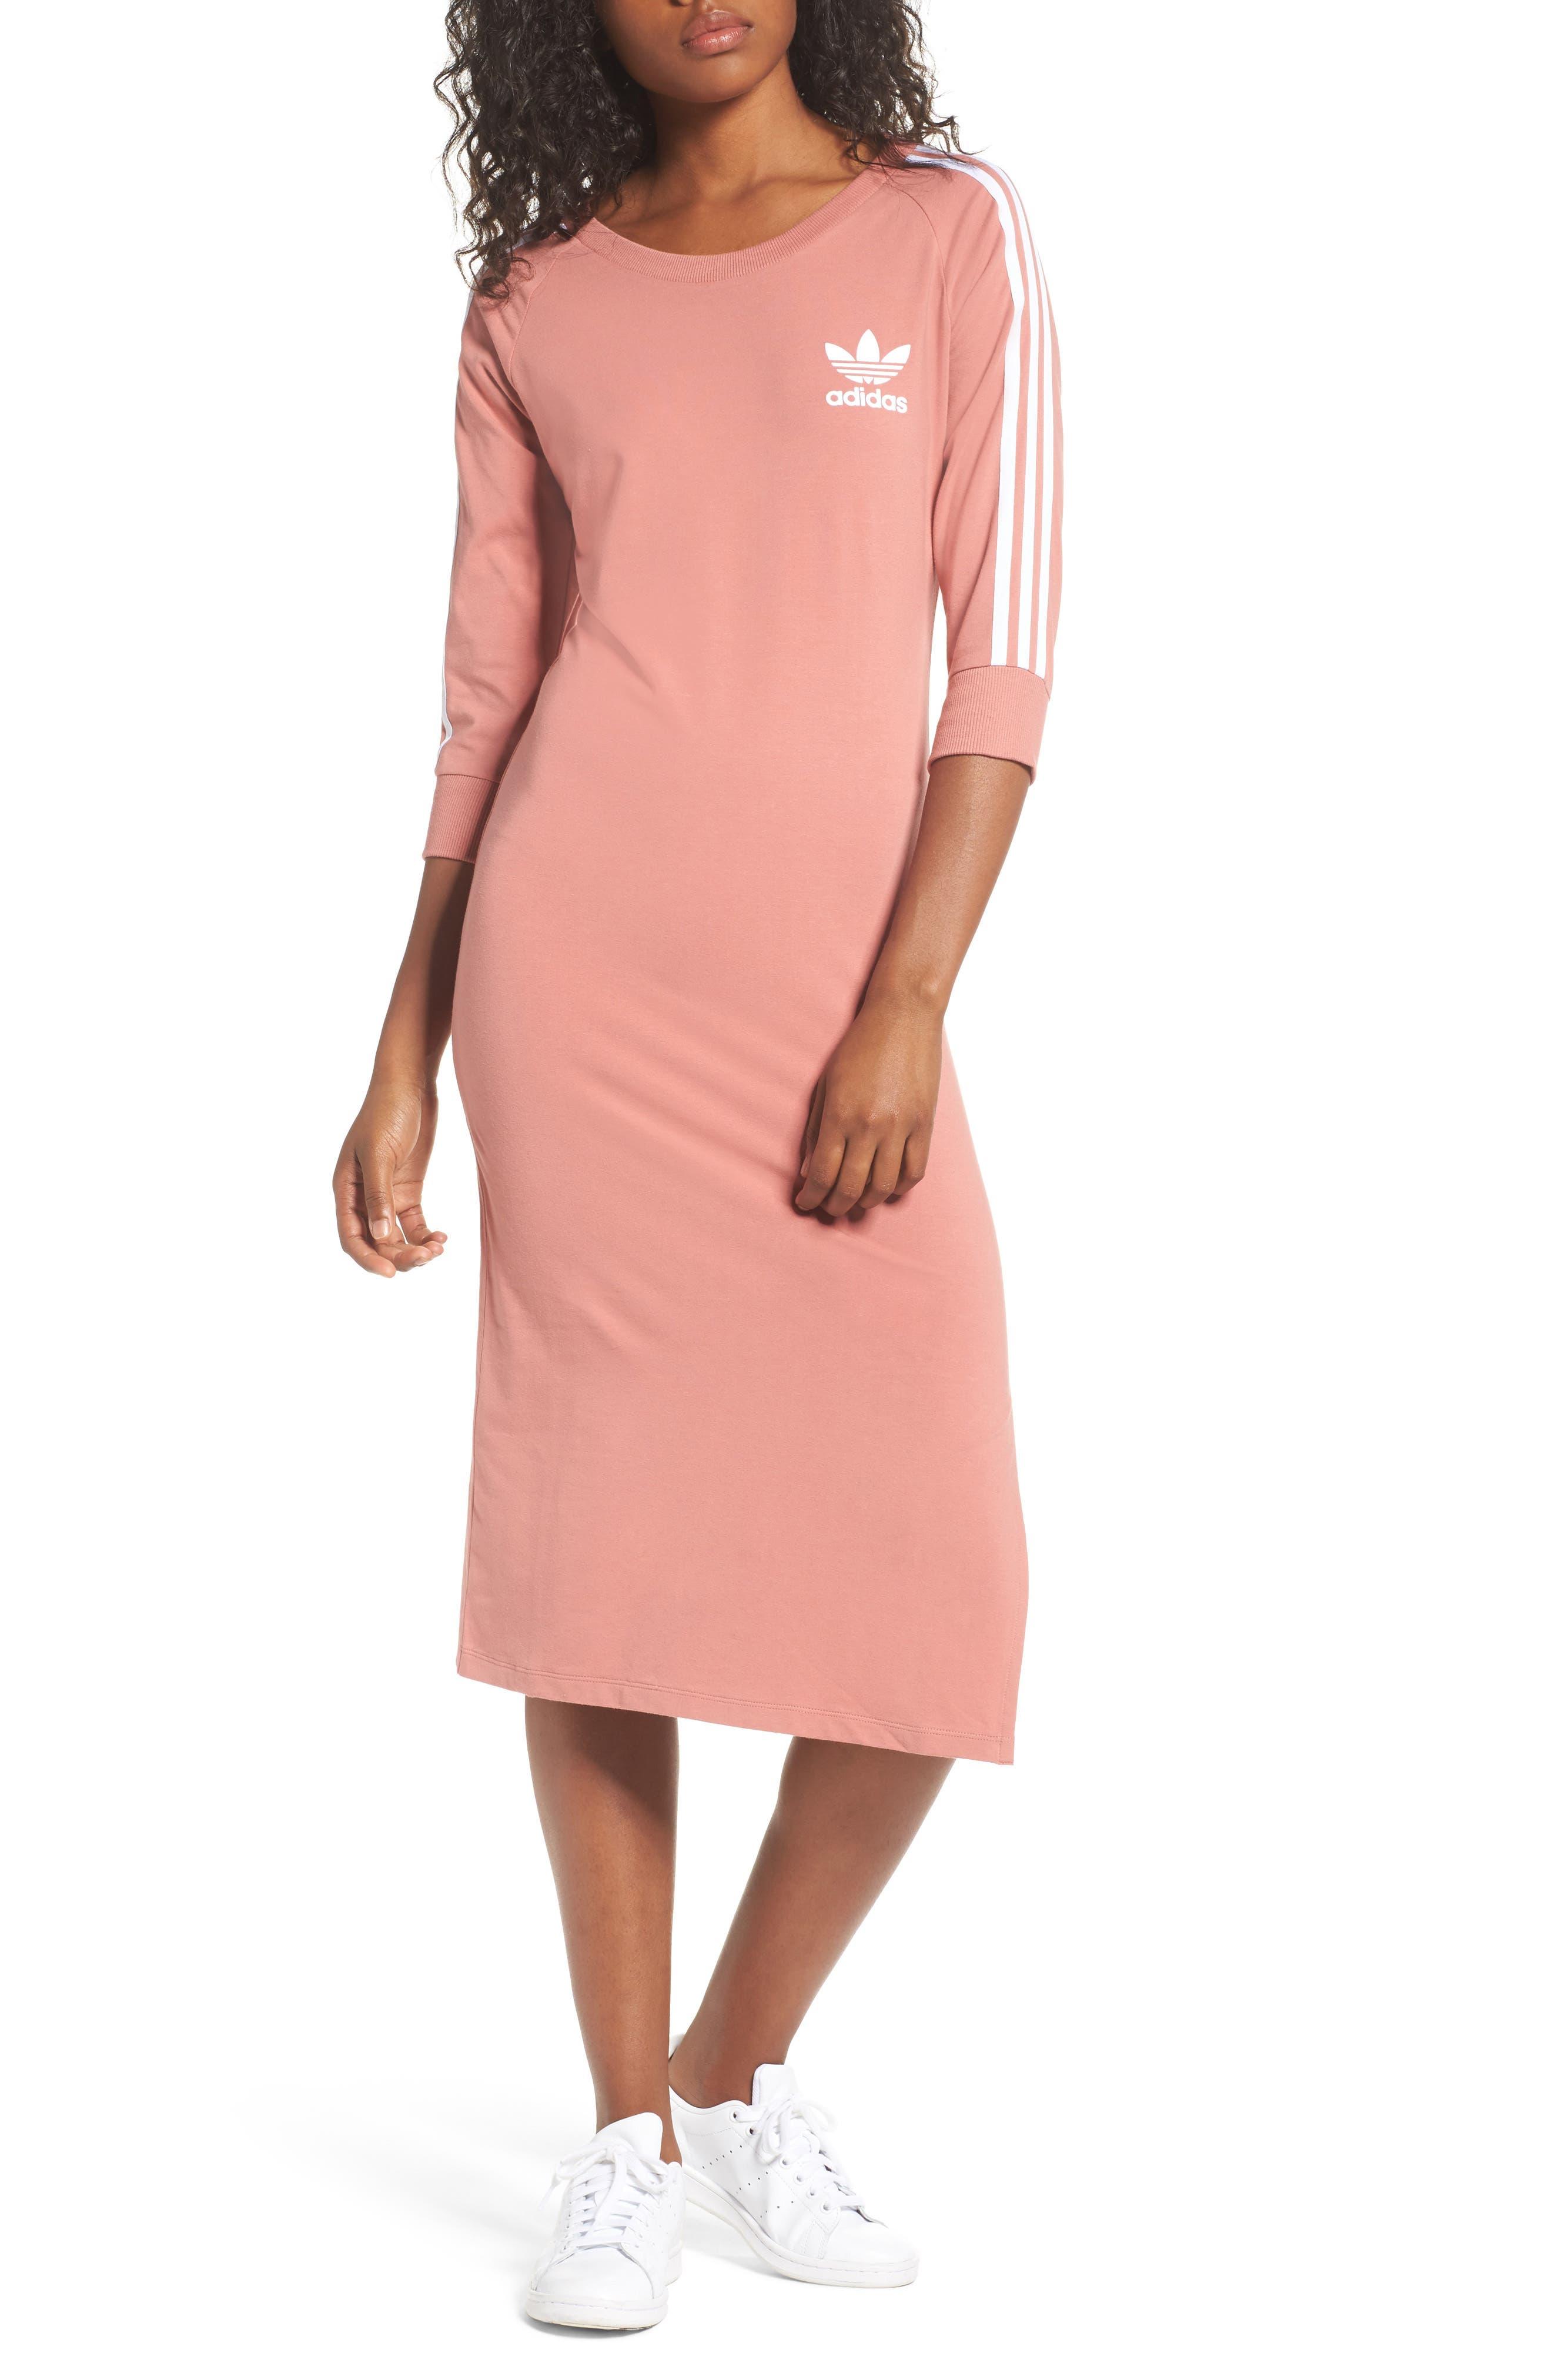 Originals 3-Stripes Dress,                         Main,                         color, Raw Pink